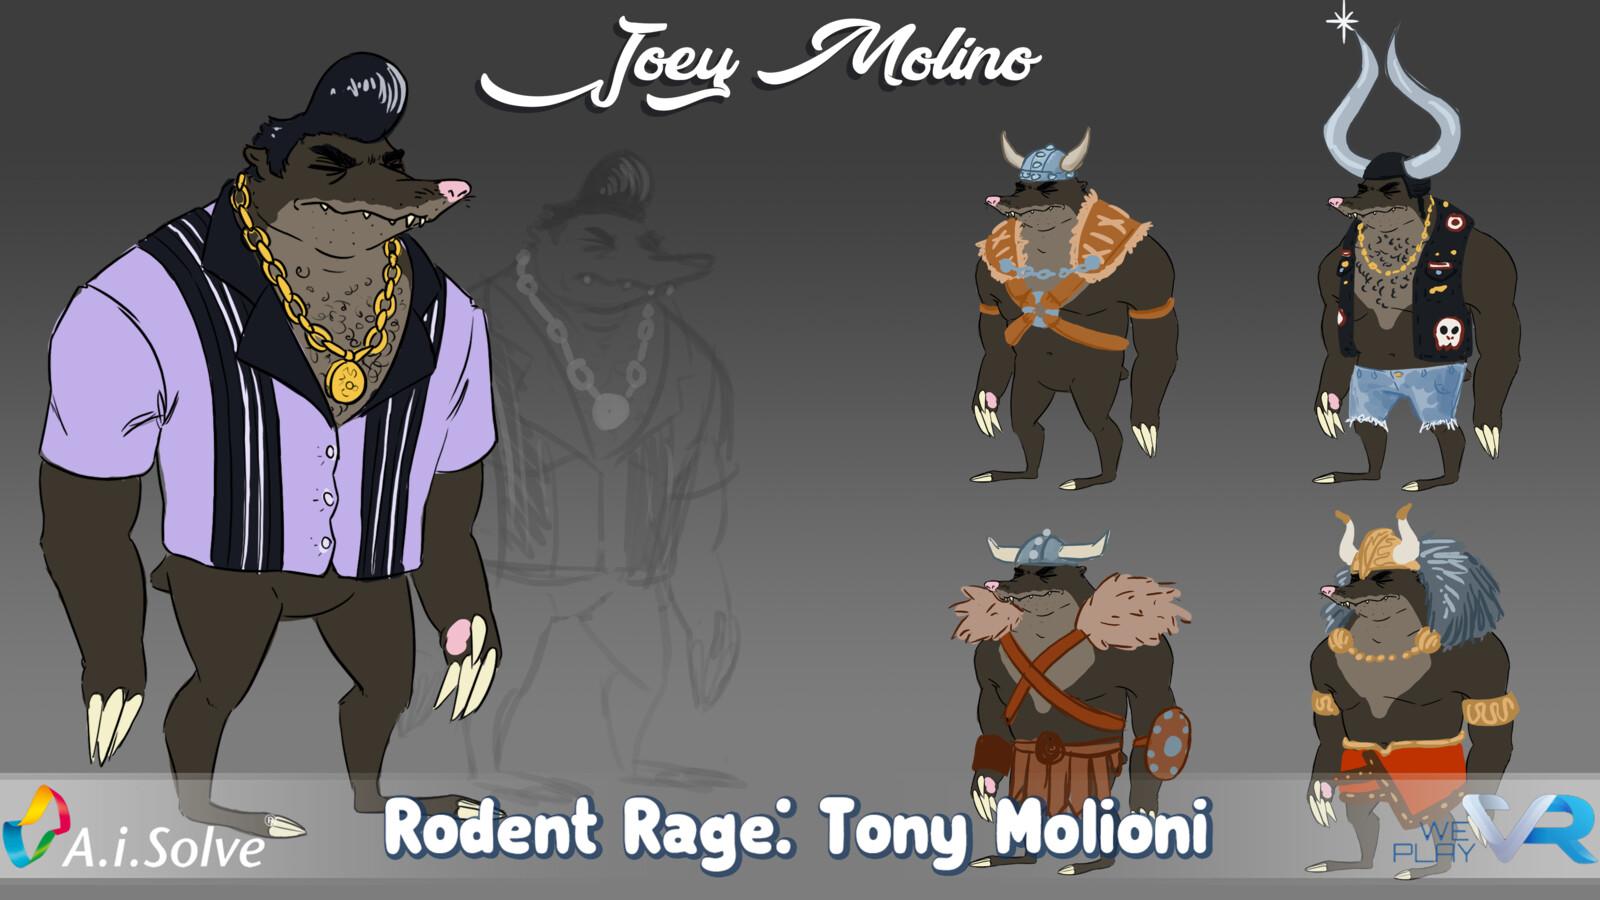 Rodent Rage: Tony Molioni